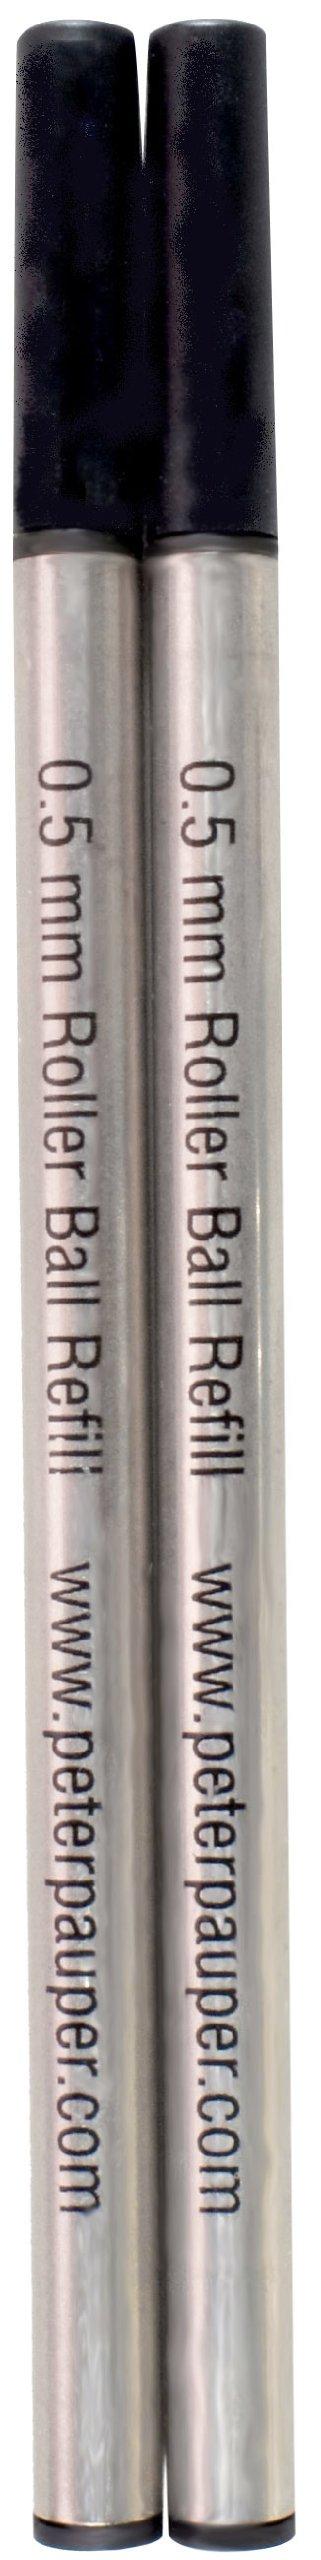 Roller Ball Pen Refill (2-Pack) (Rollerball Pen) (Designer Pens) by Peter Pauper Press (Image #2)